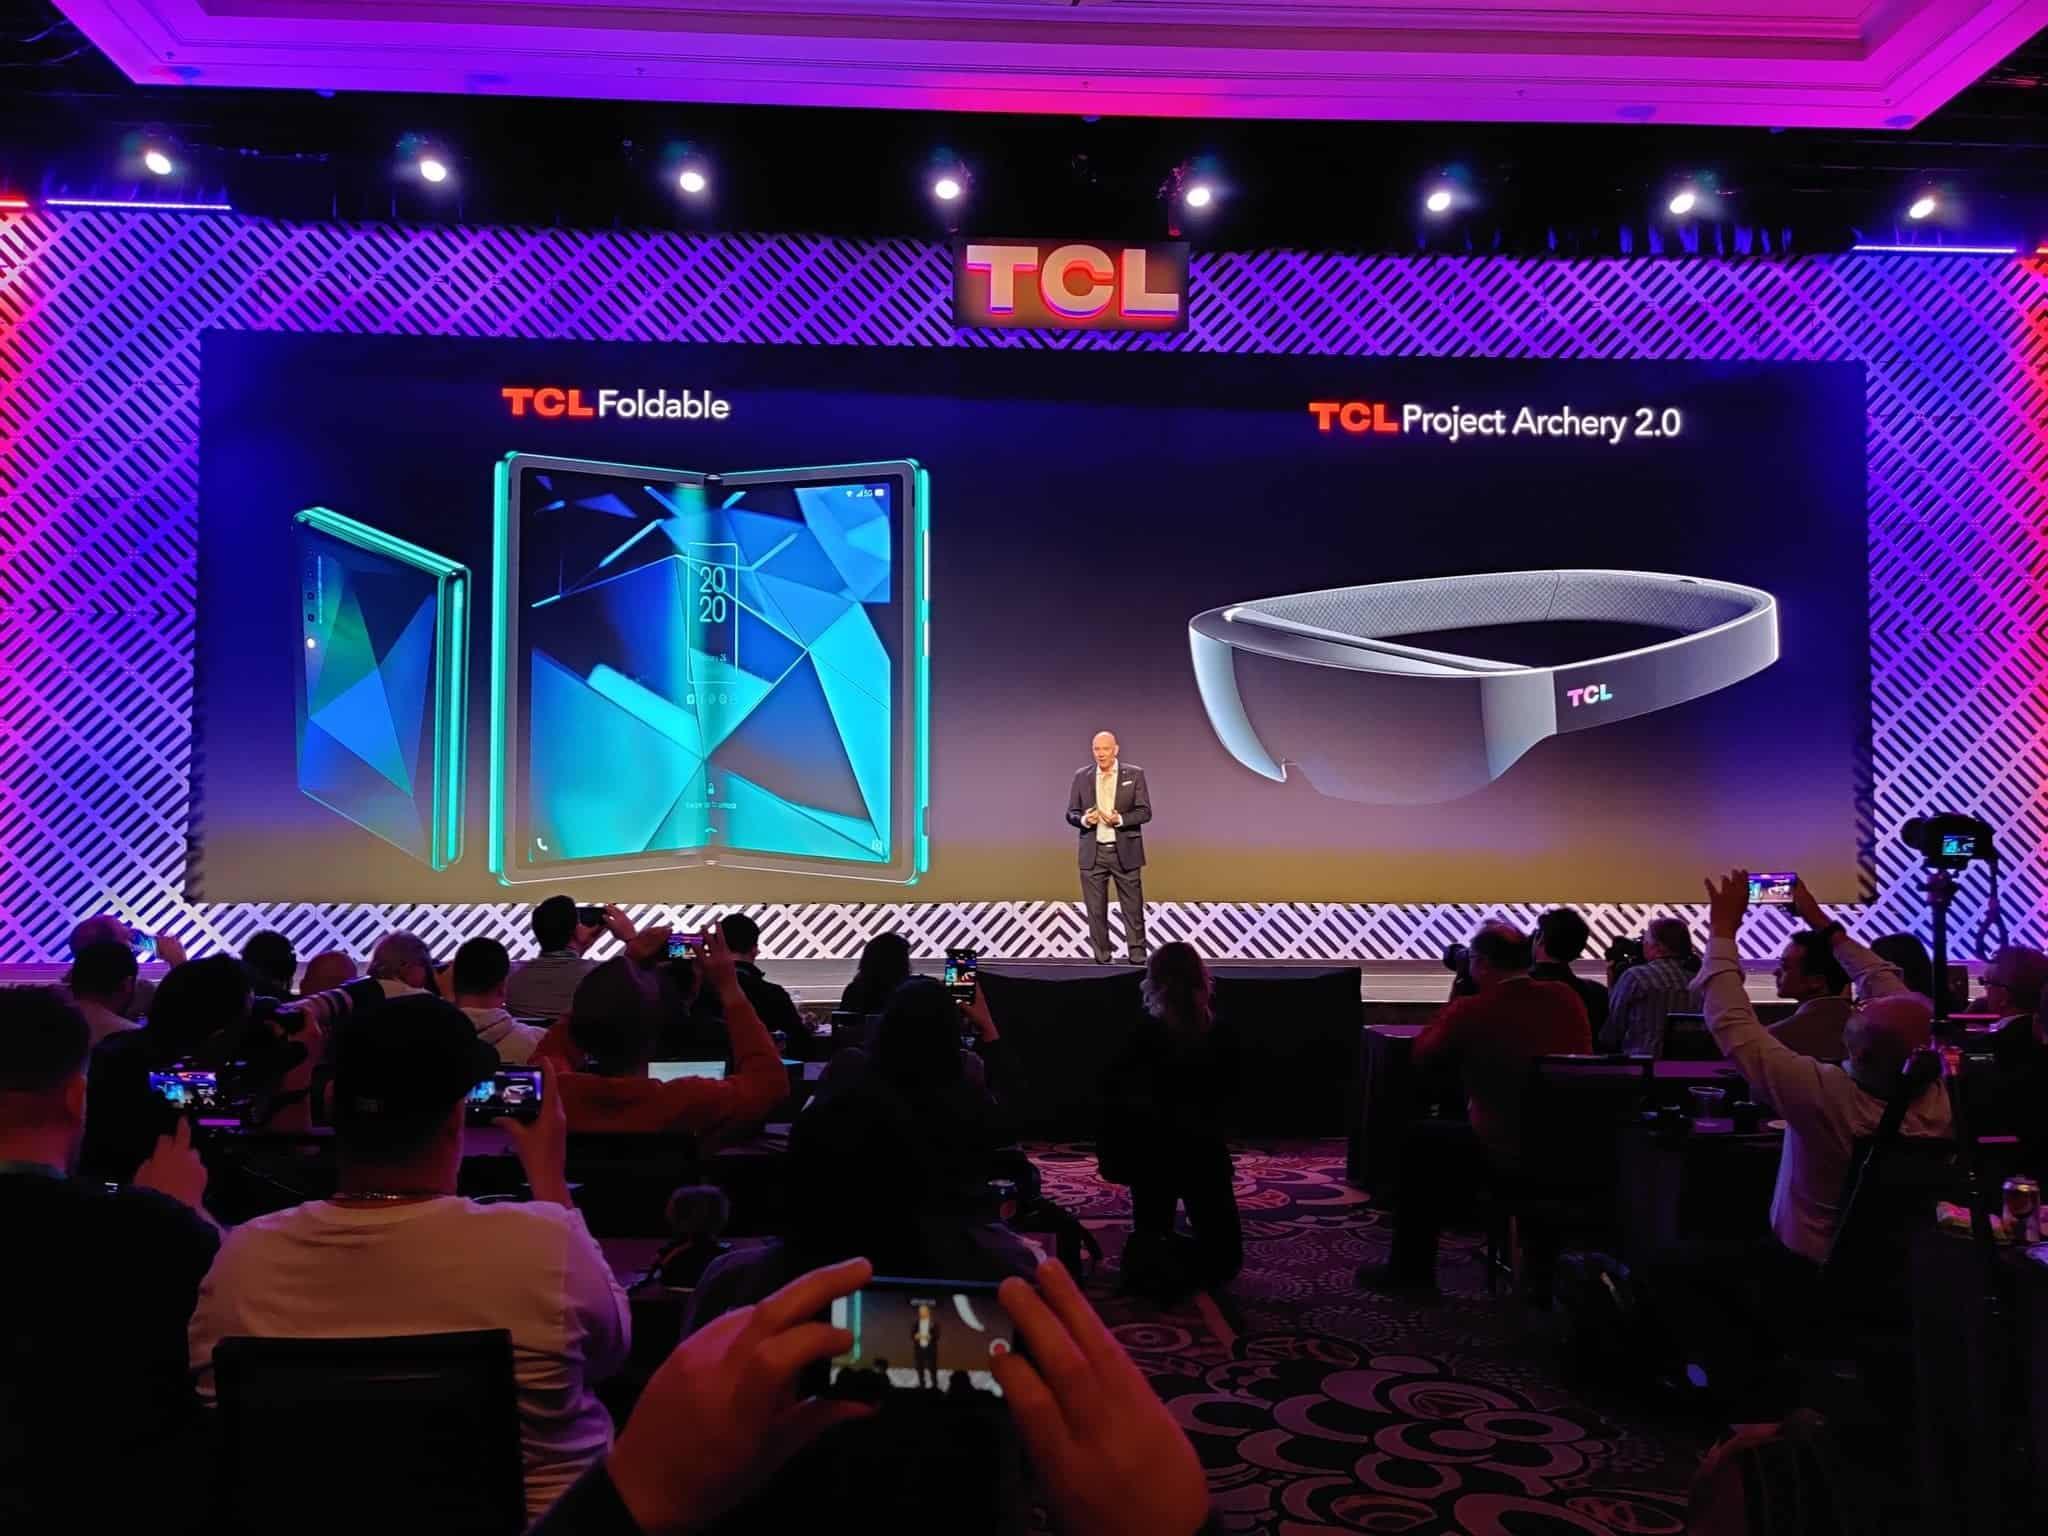 TCL Foldable